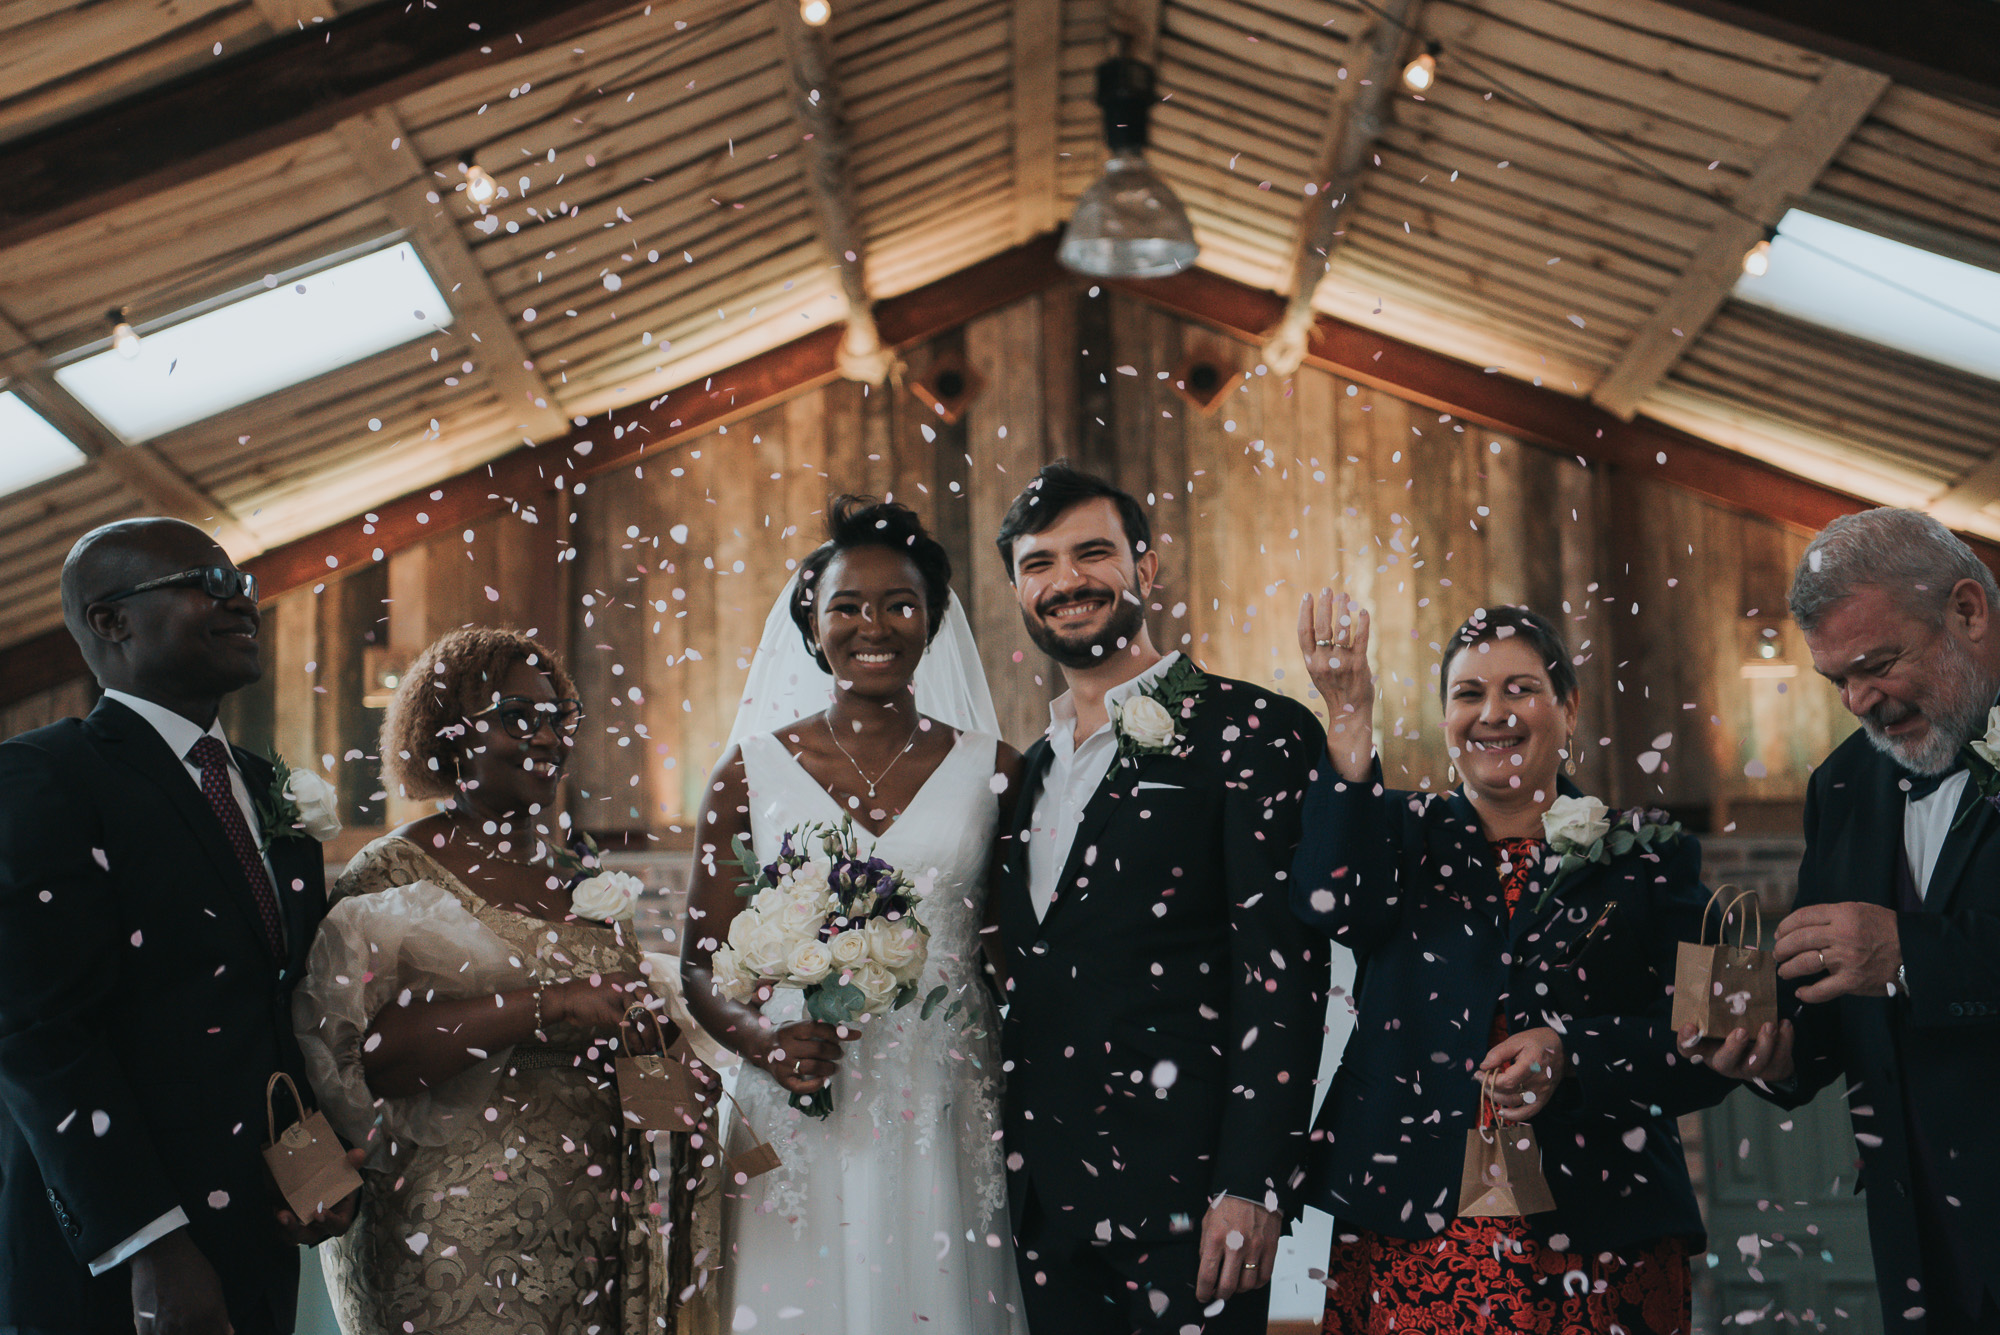 Owen HOuse Wedding Barn WEdding Photographer cheshire adam joe roberts photography (23 of 36).jpg